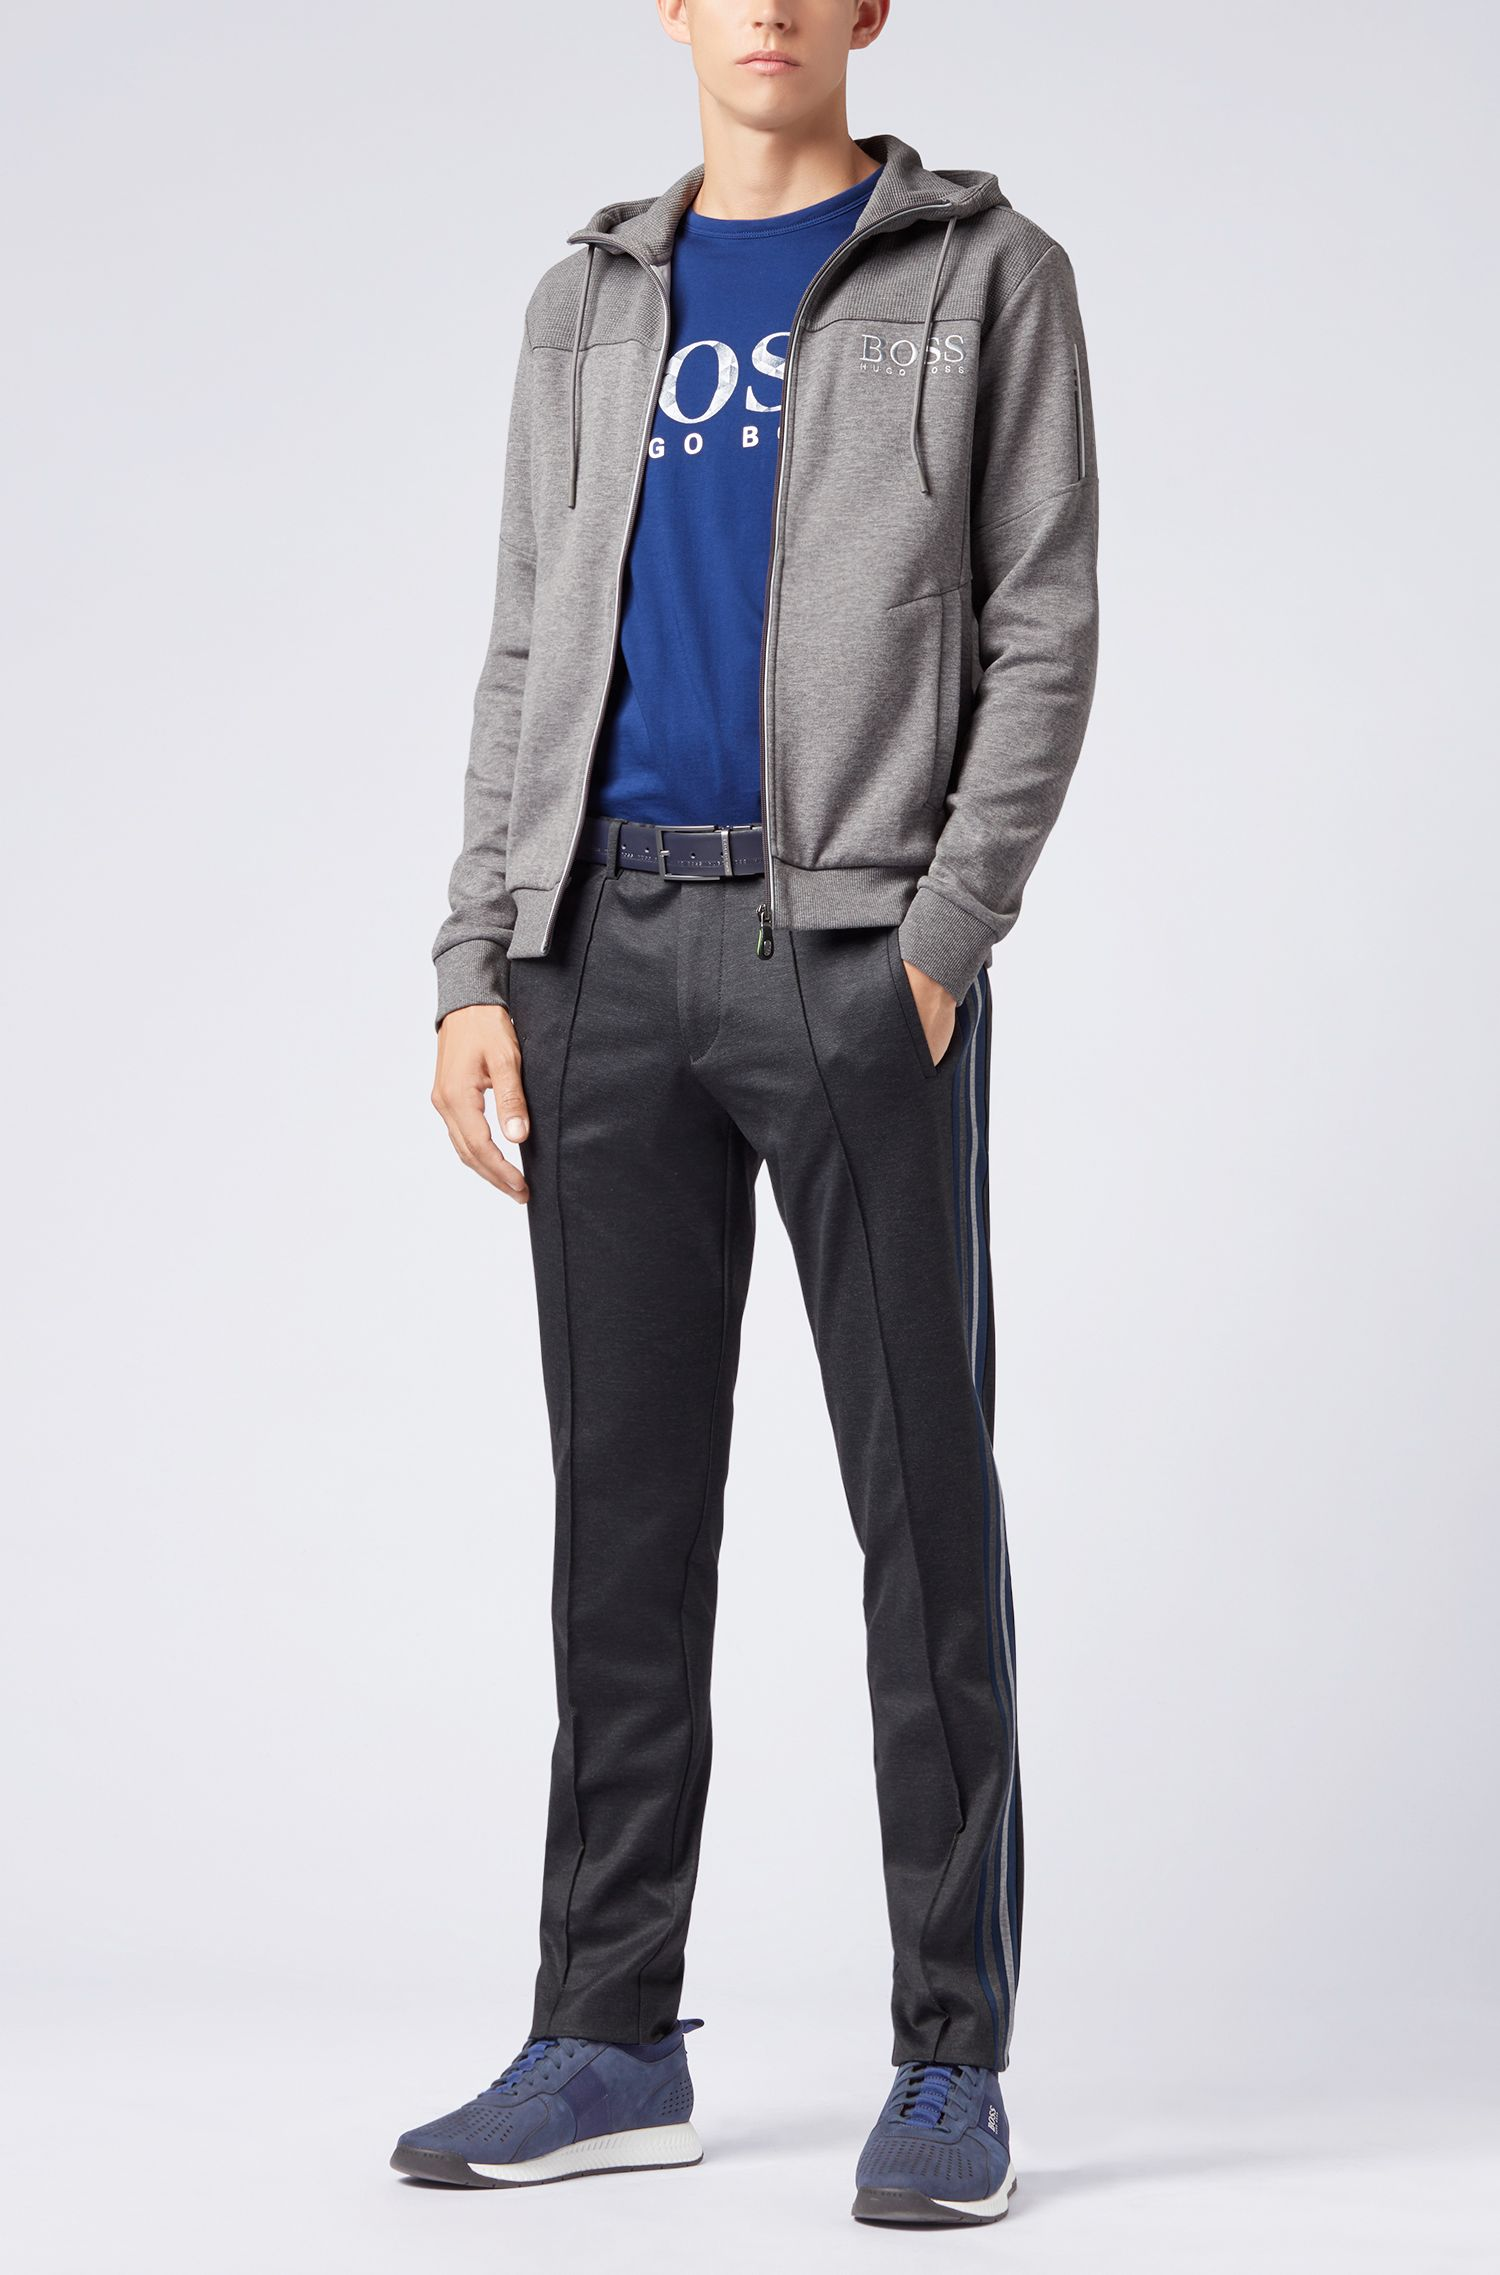 Camiseta de manga corta en algodón con logo gráfico estampado, Azul